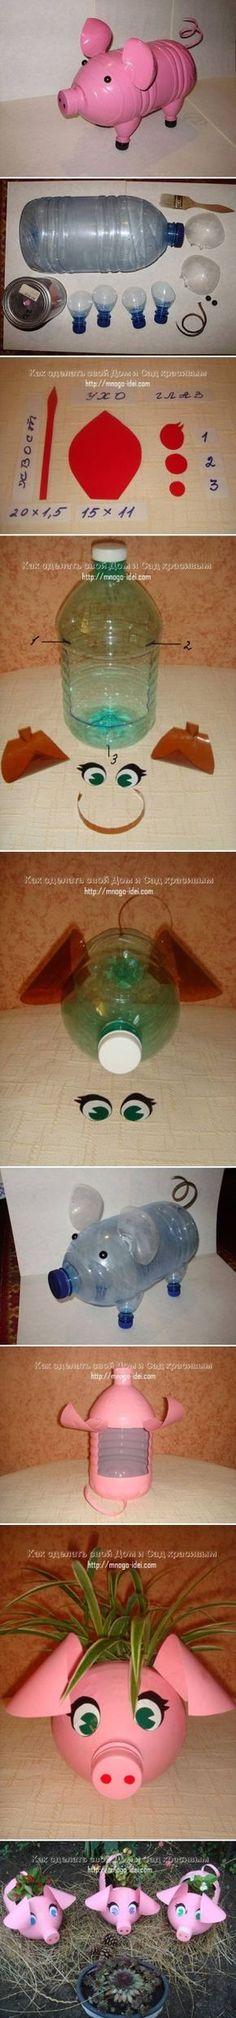 DIY Plastic Bottle Piggy Plant Vase DIY Plastic Bottle Piggy Plant Vase by diyforever